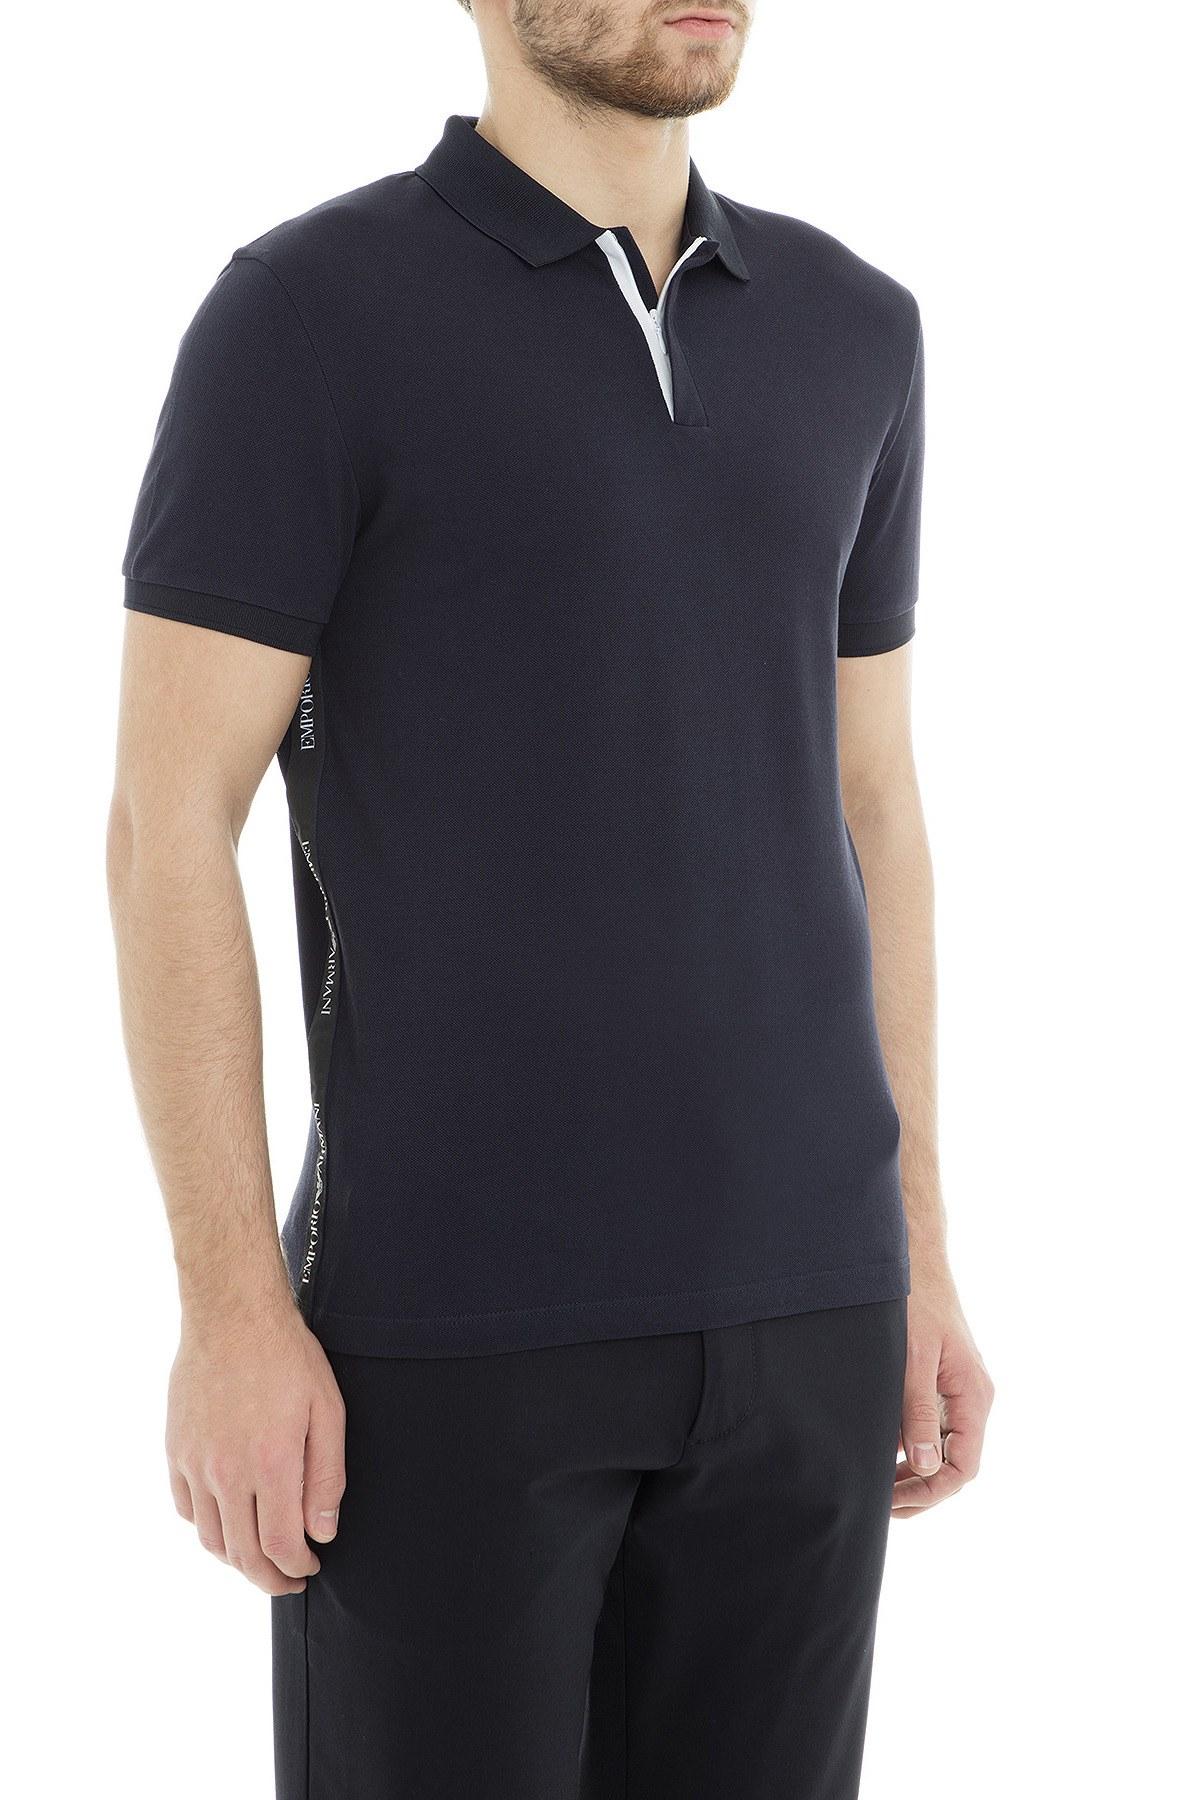 Emporio Armani Polo Erkek T Shirt 3G1F61 1J0SZ 0922 LACİVERT